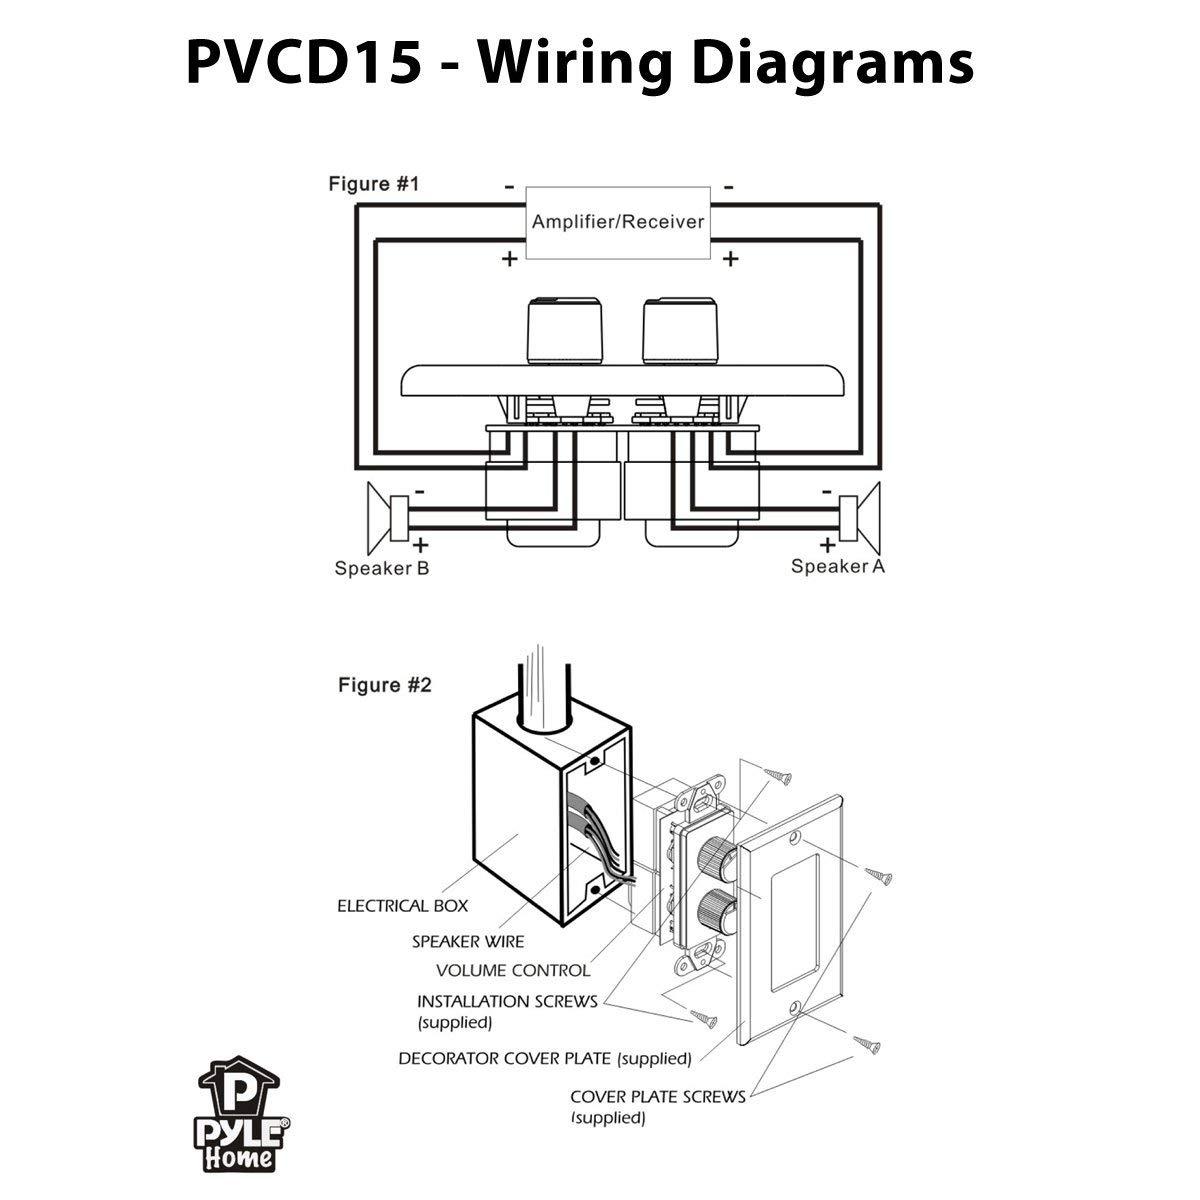 Pro Armor sound Bar Wiring Diagram Download | Wiring Diagram ... on